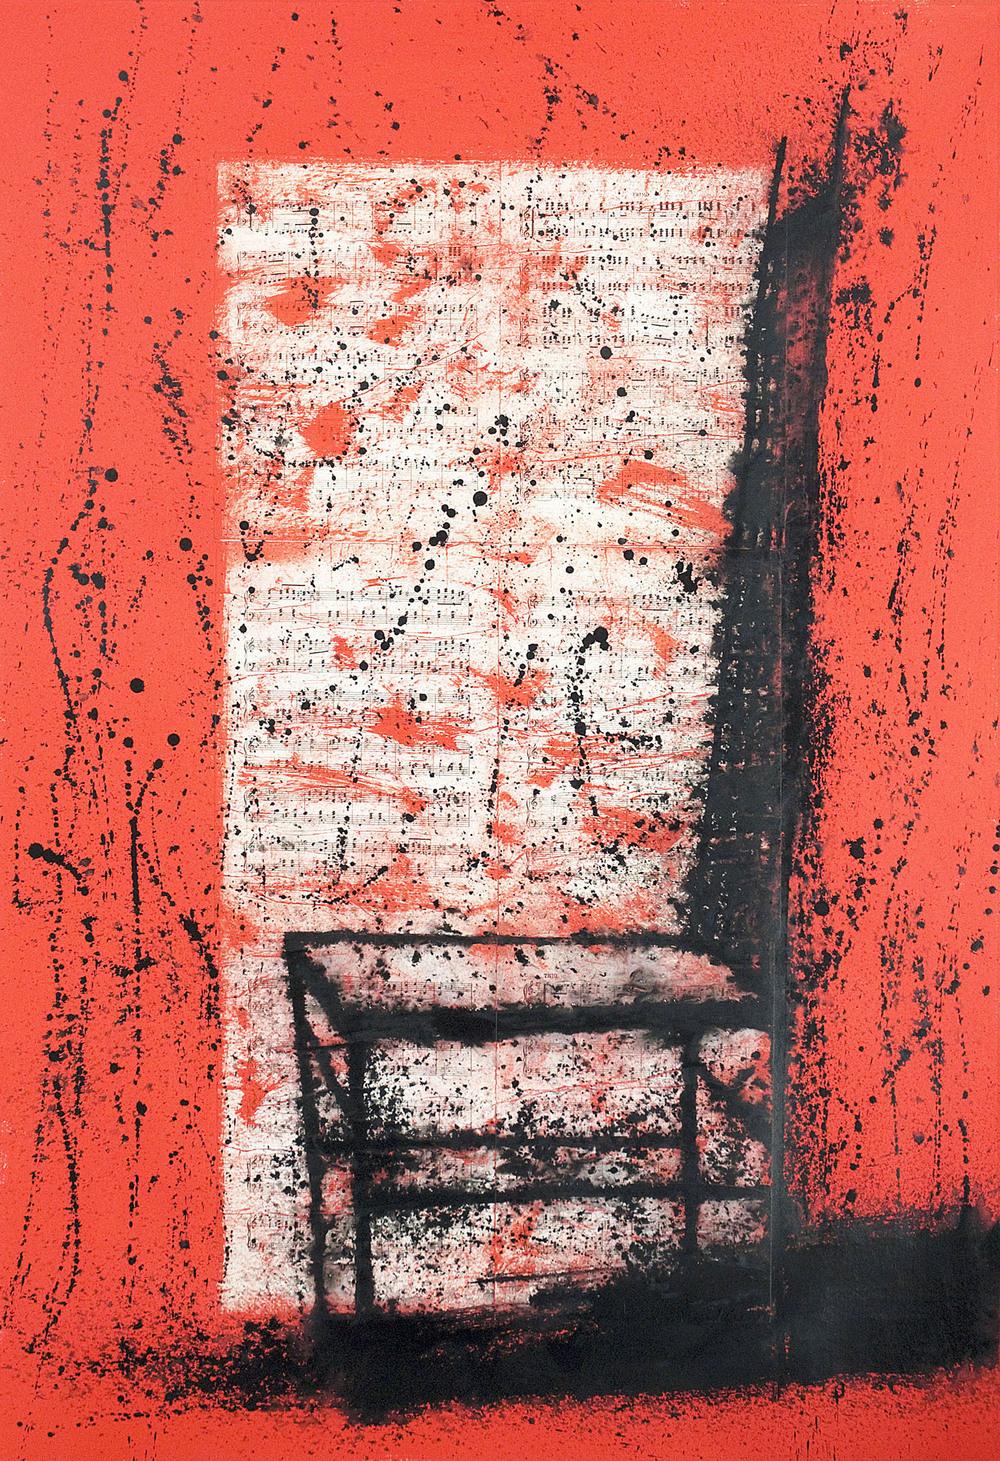 Neil Shawcross_2007_Chair #16_acrylic on paper_132 x 91.5cm.jpg